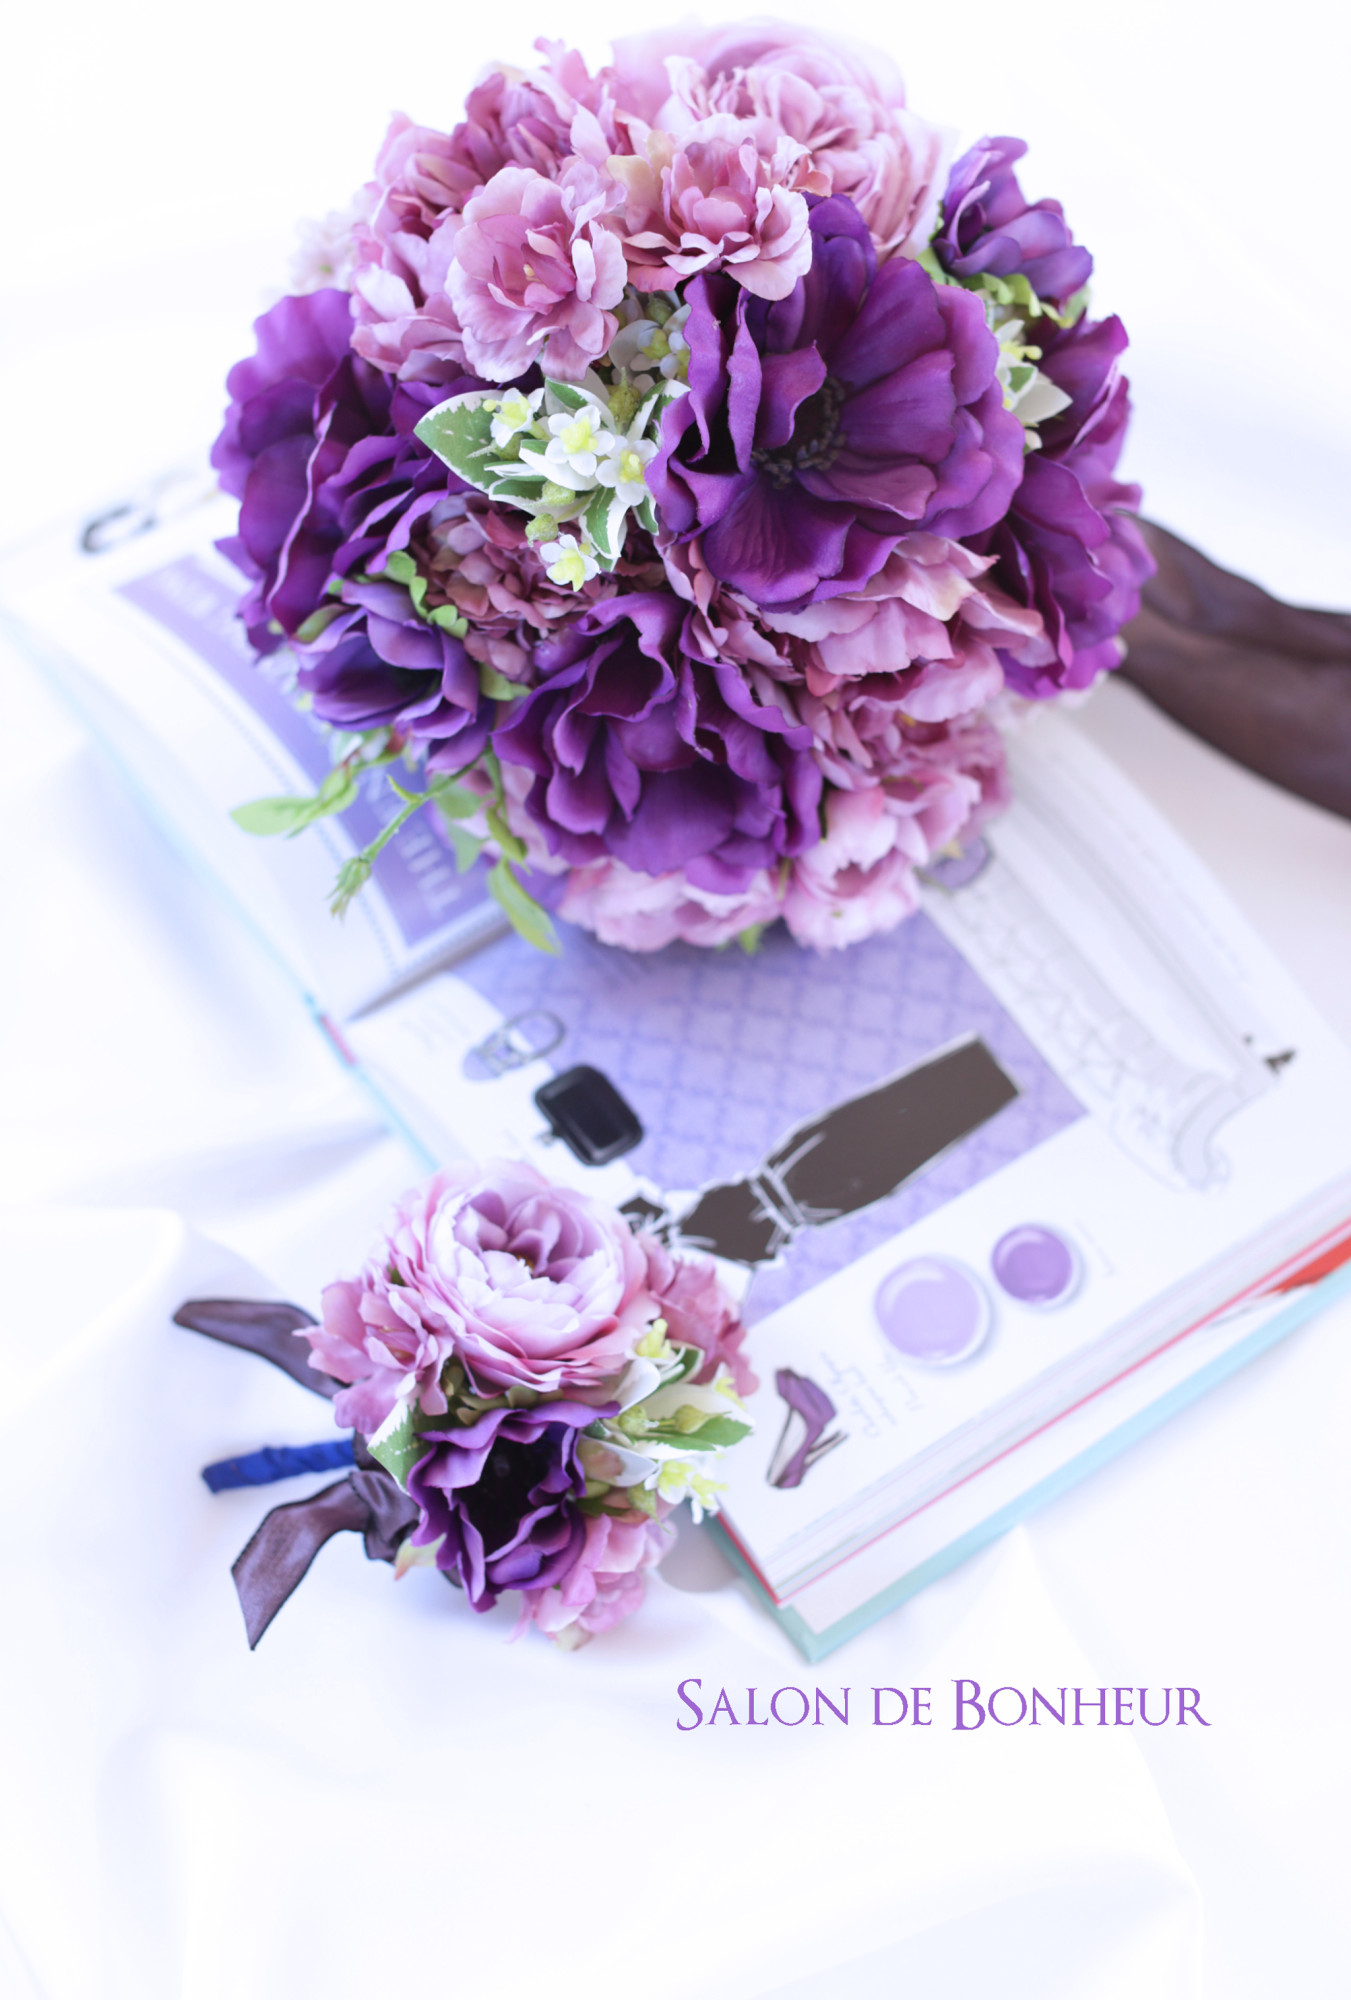 b_bouquet20180211_2